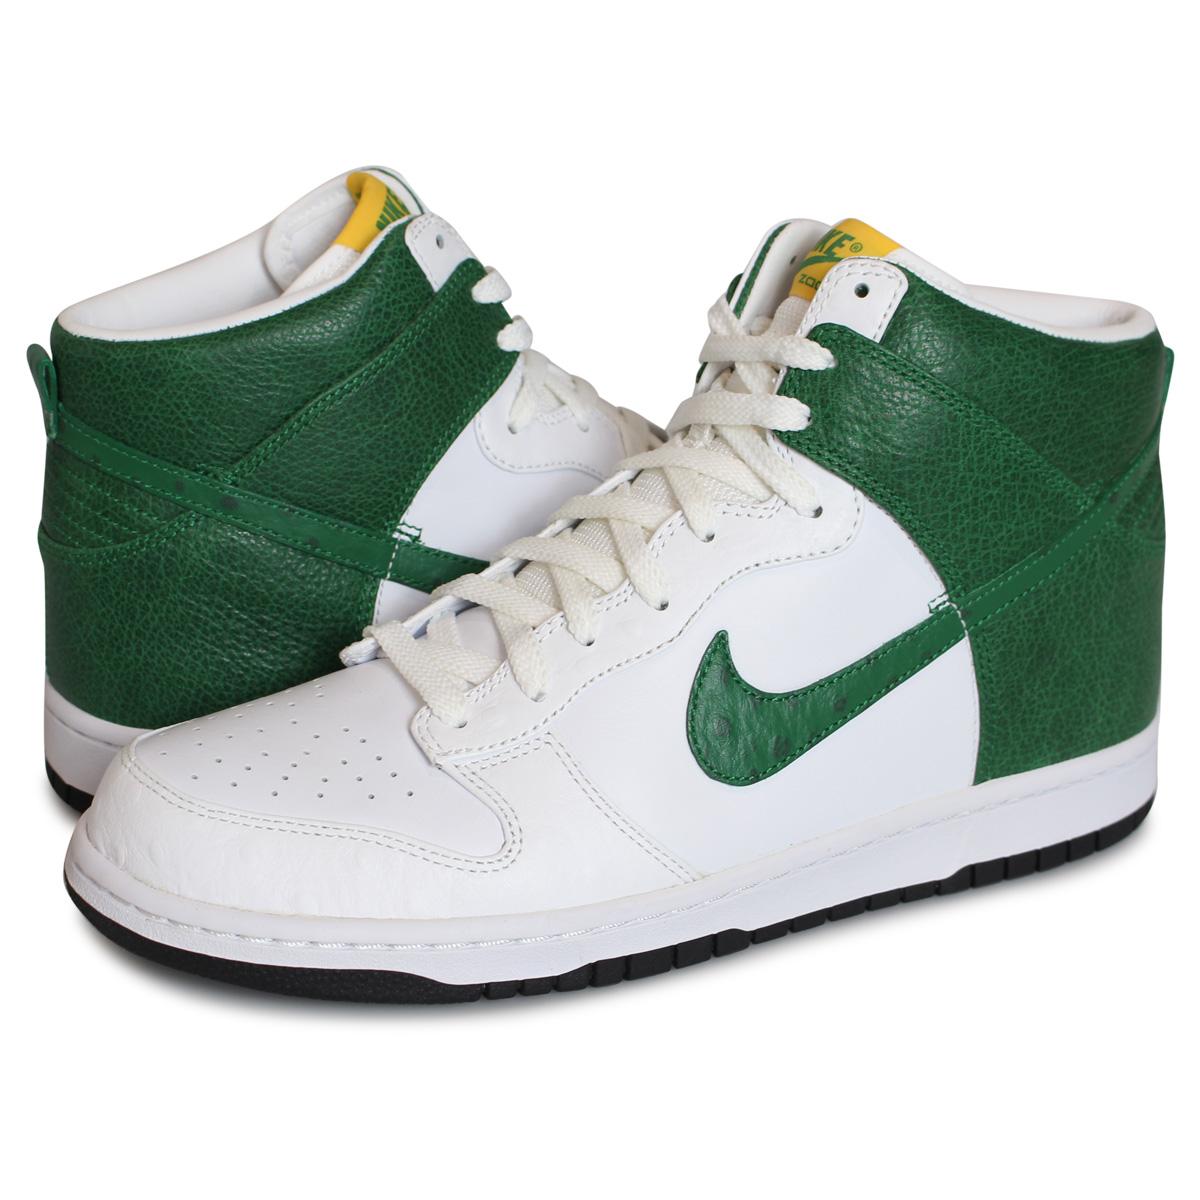 exagerar arpón Costoso  Goods Lab: Nike NIKE dunk high sneakers men DUNK HIGH PREMIUM ...